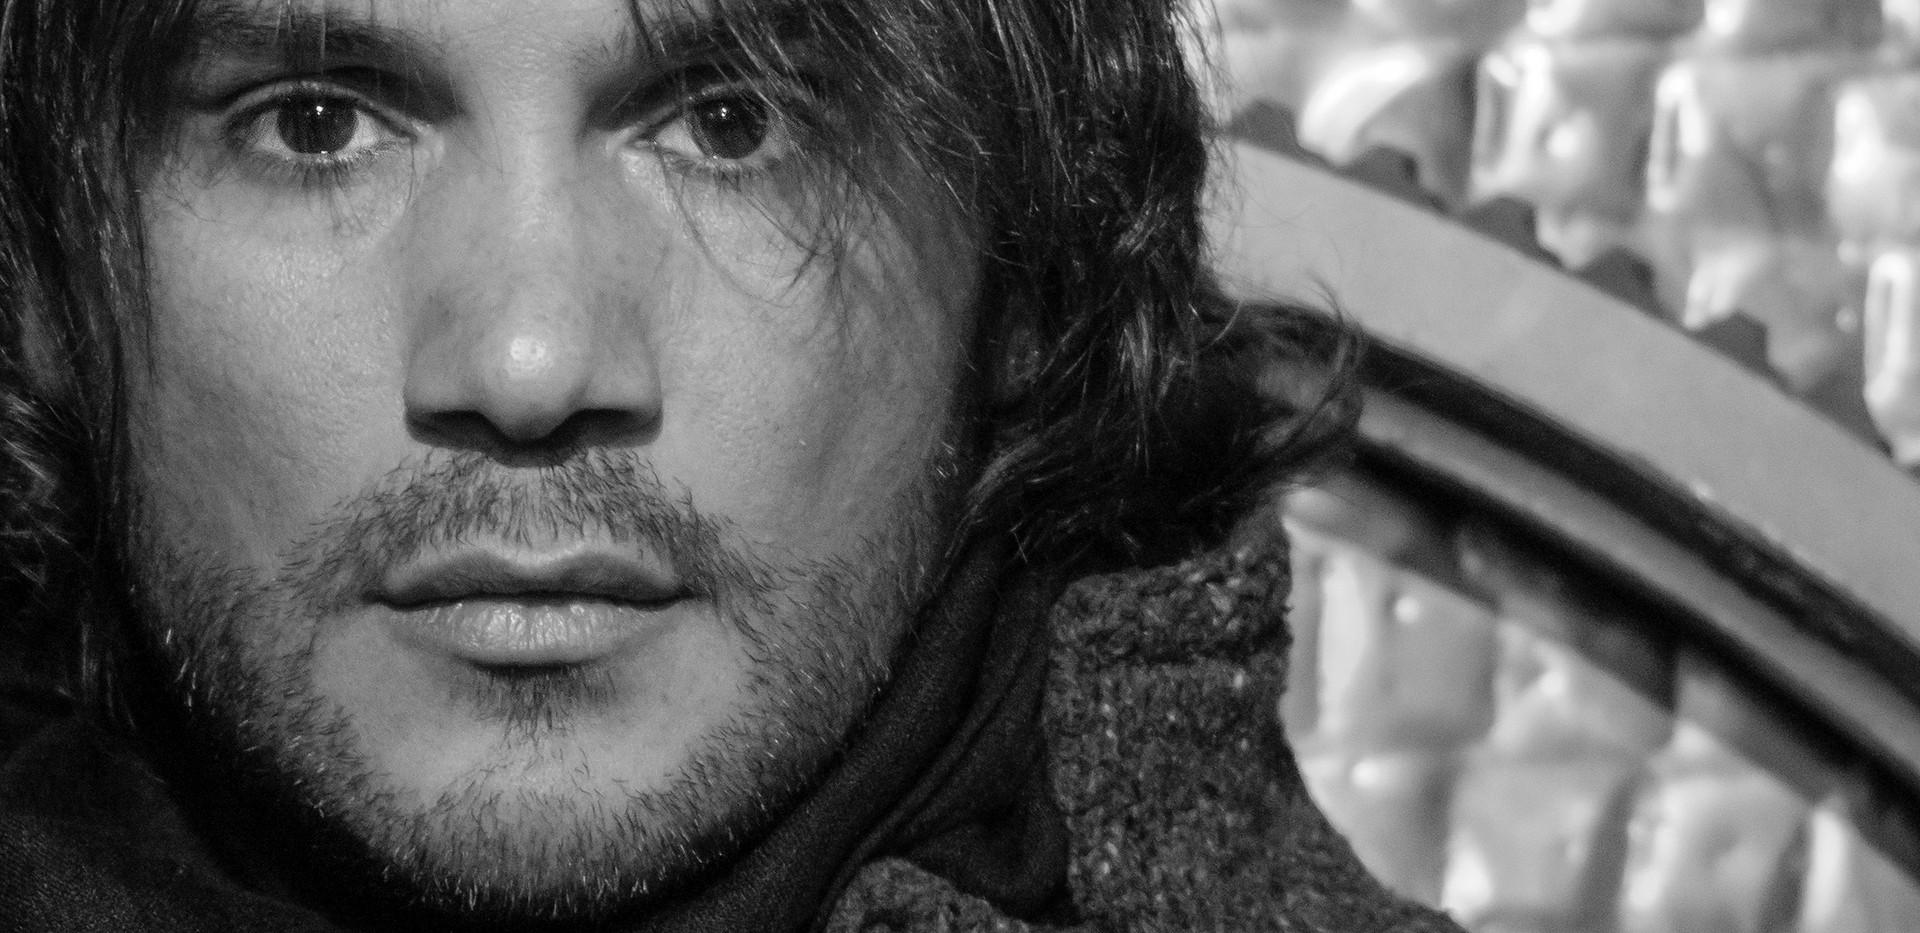 Producer/Artist Francesco Rossi